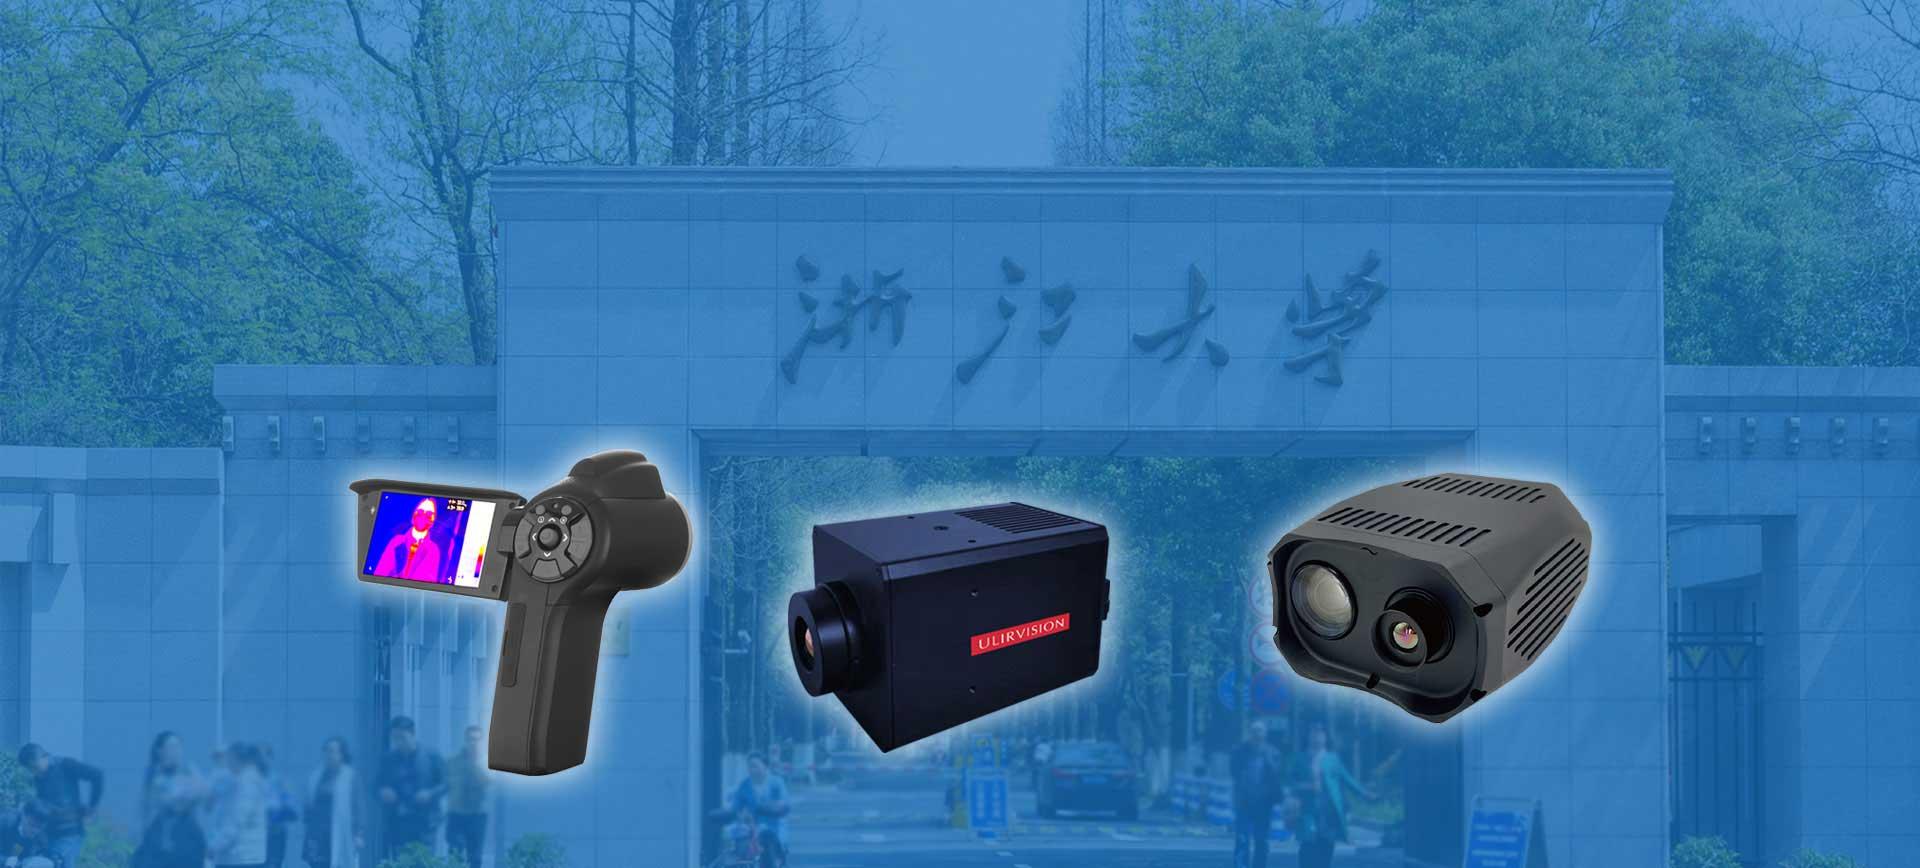 Zhejiang ULIRVISION Technology Co., Ltd. Main Image